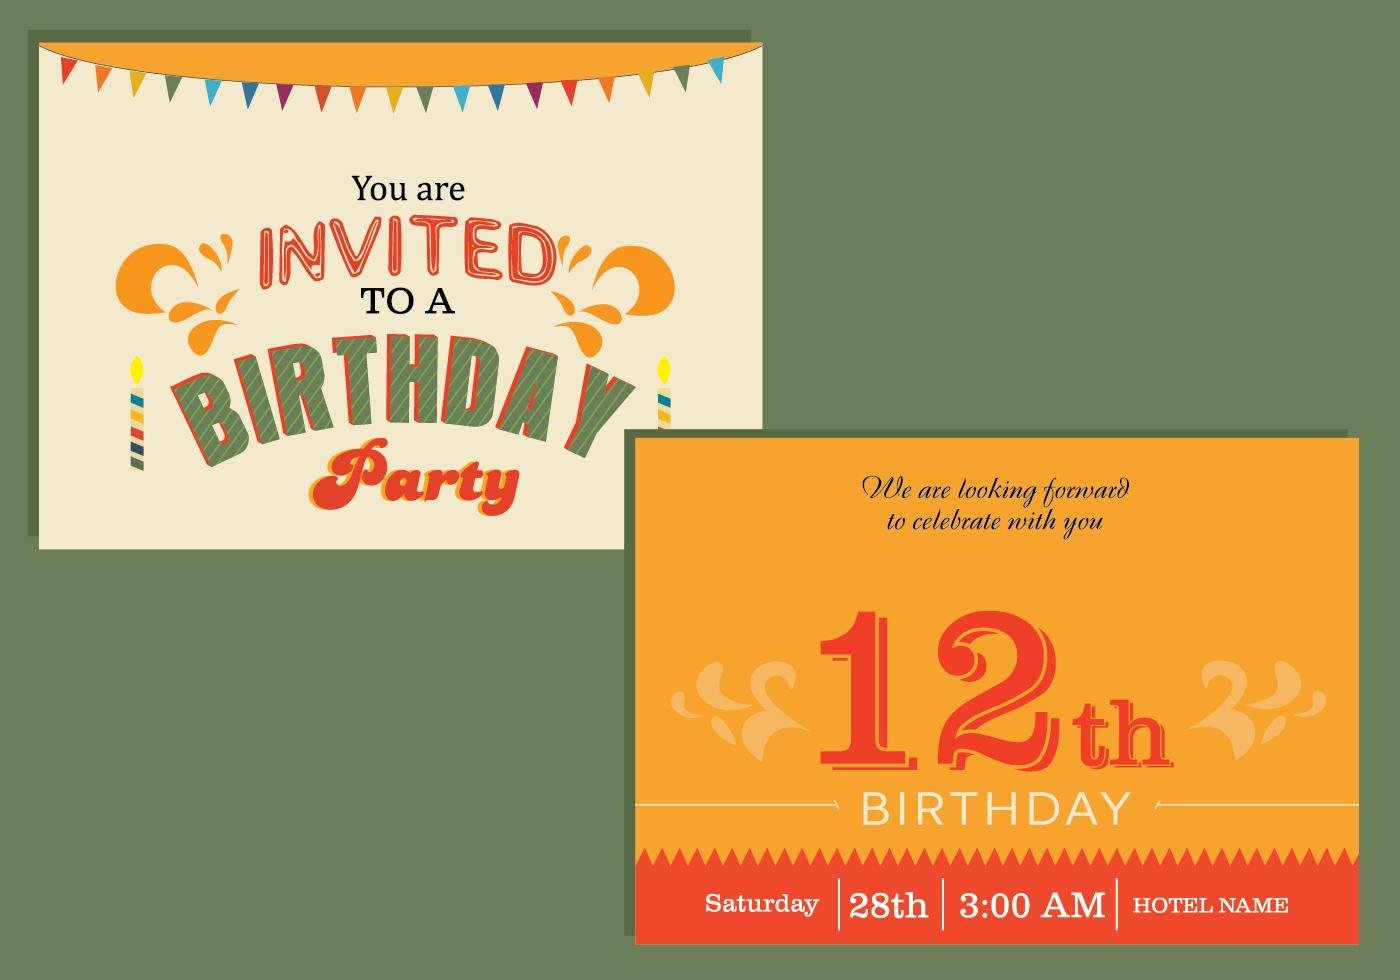 Happy Birthday Card Invitation Download Free Vector Art